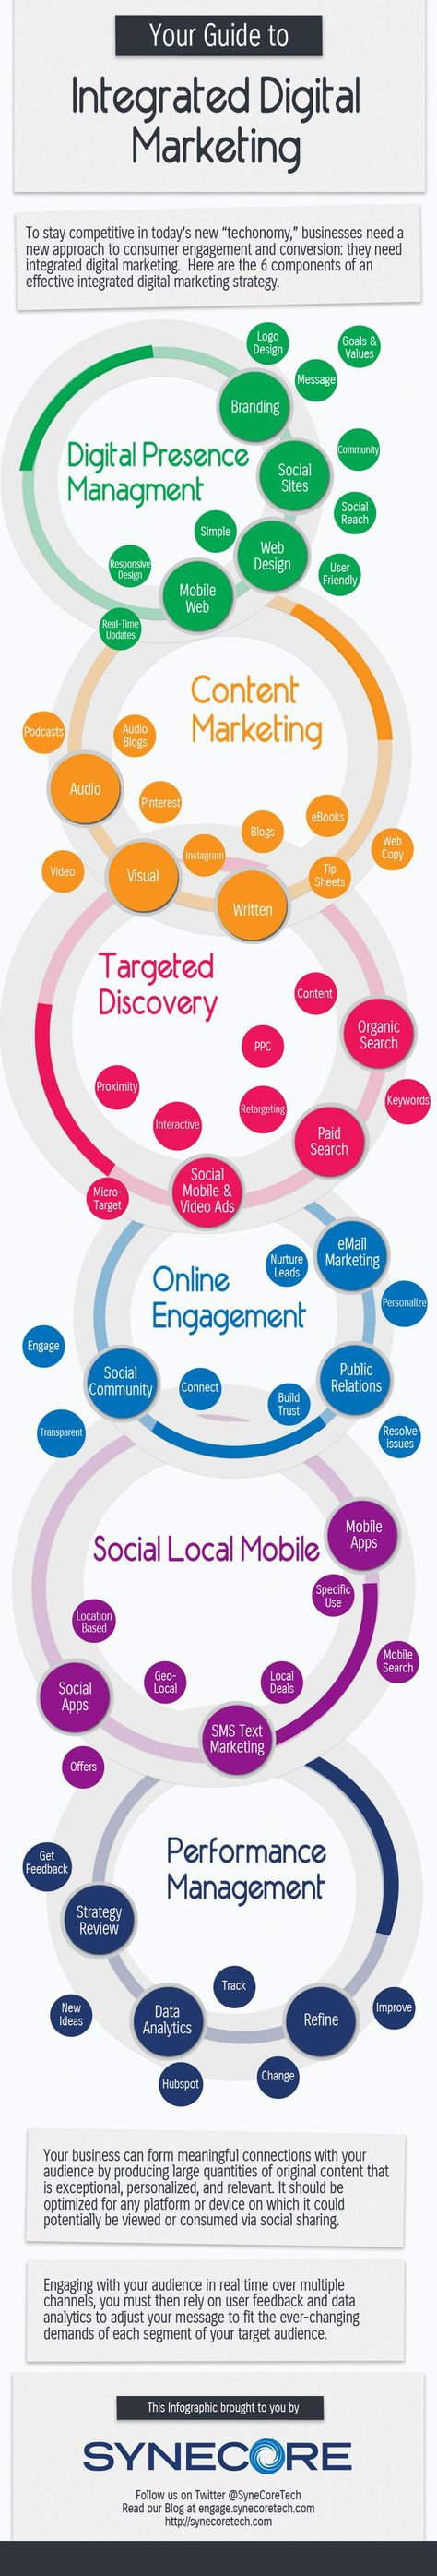 Marketing | Tipsographic